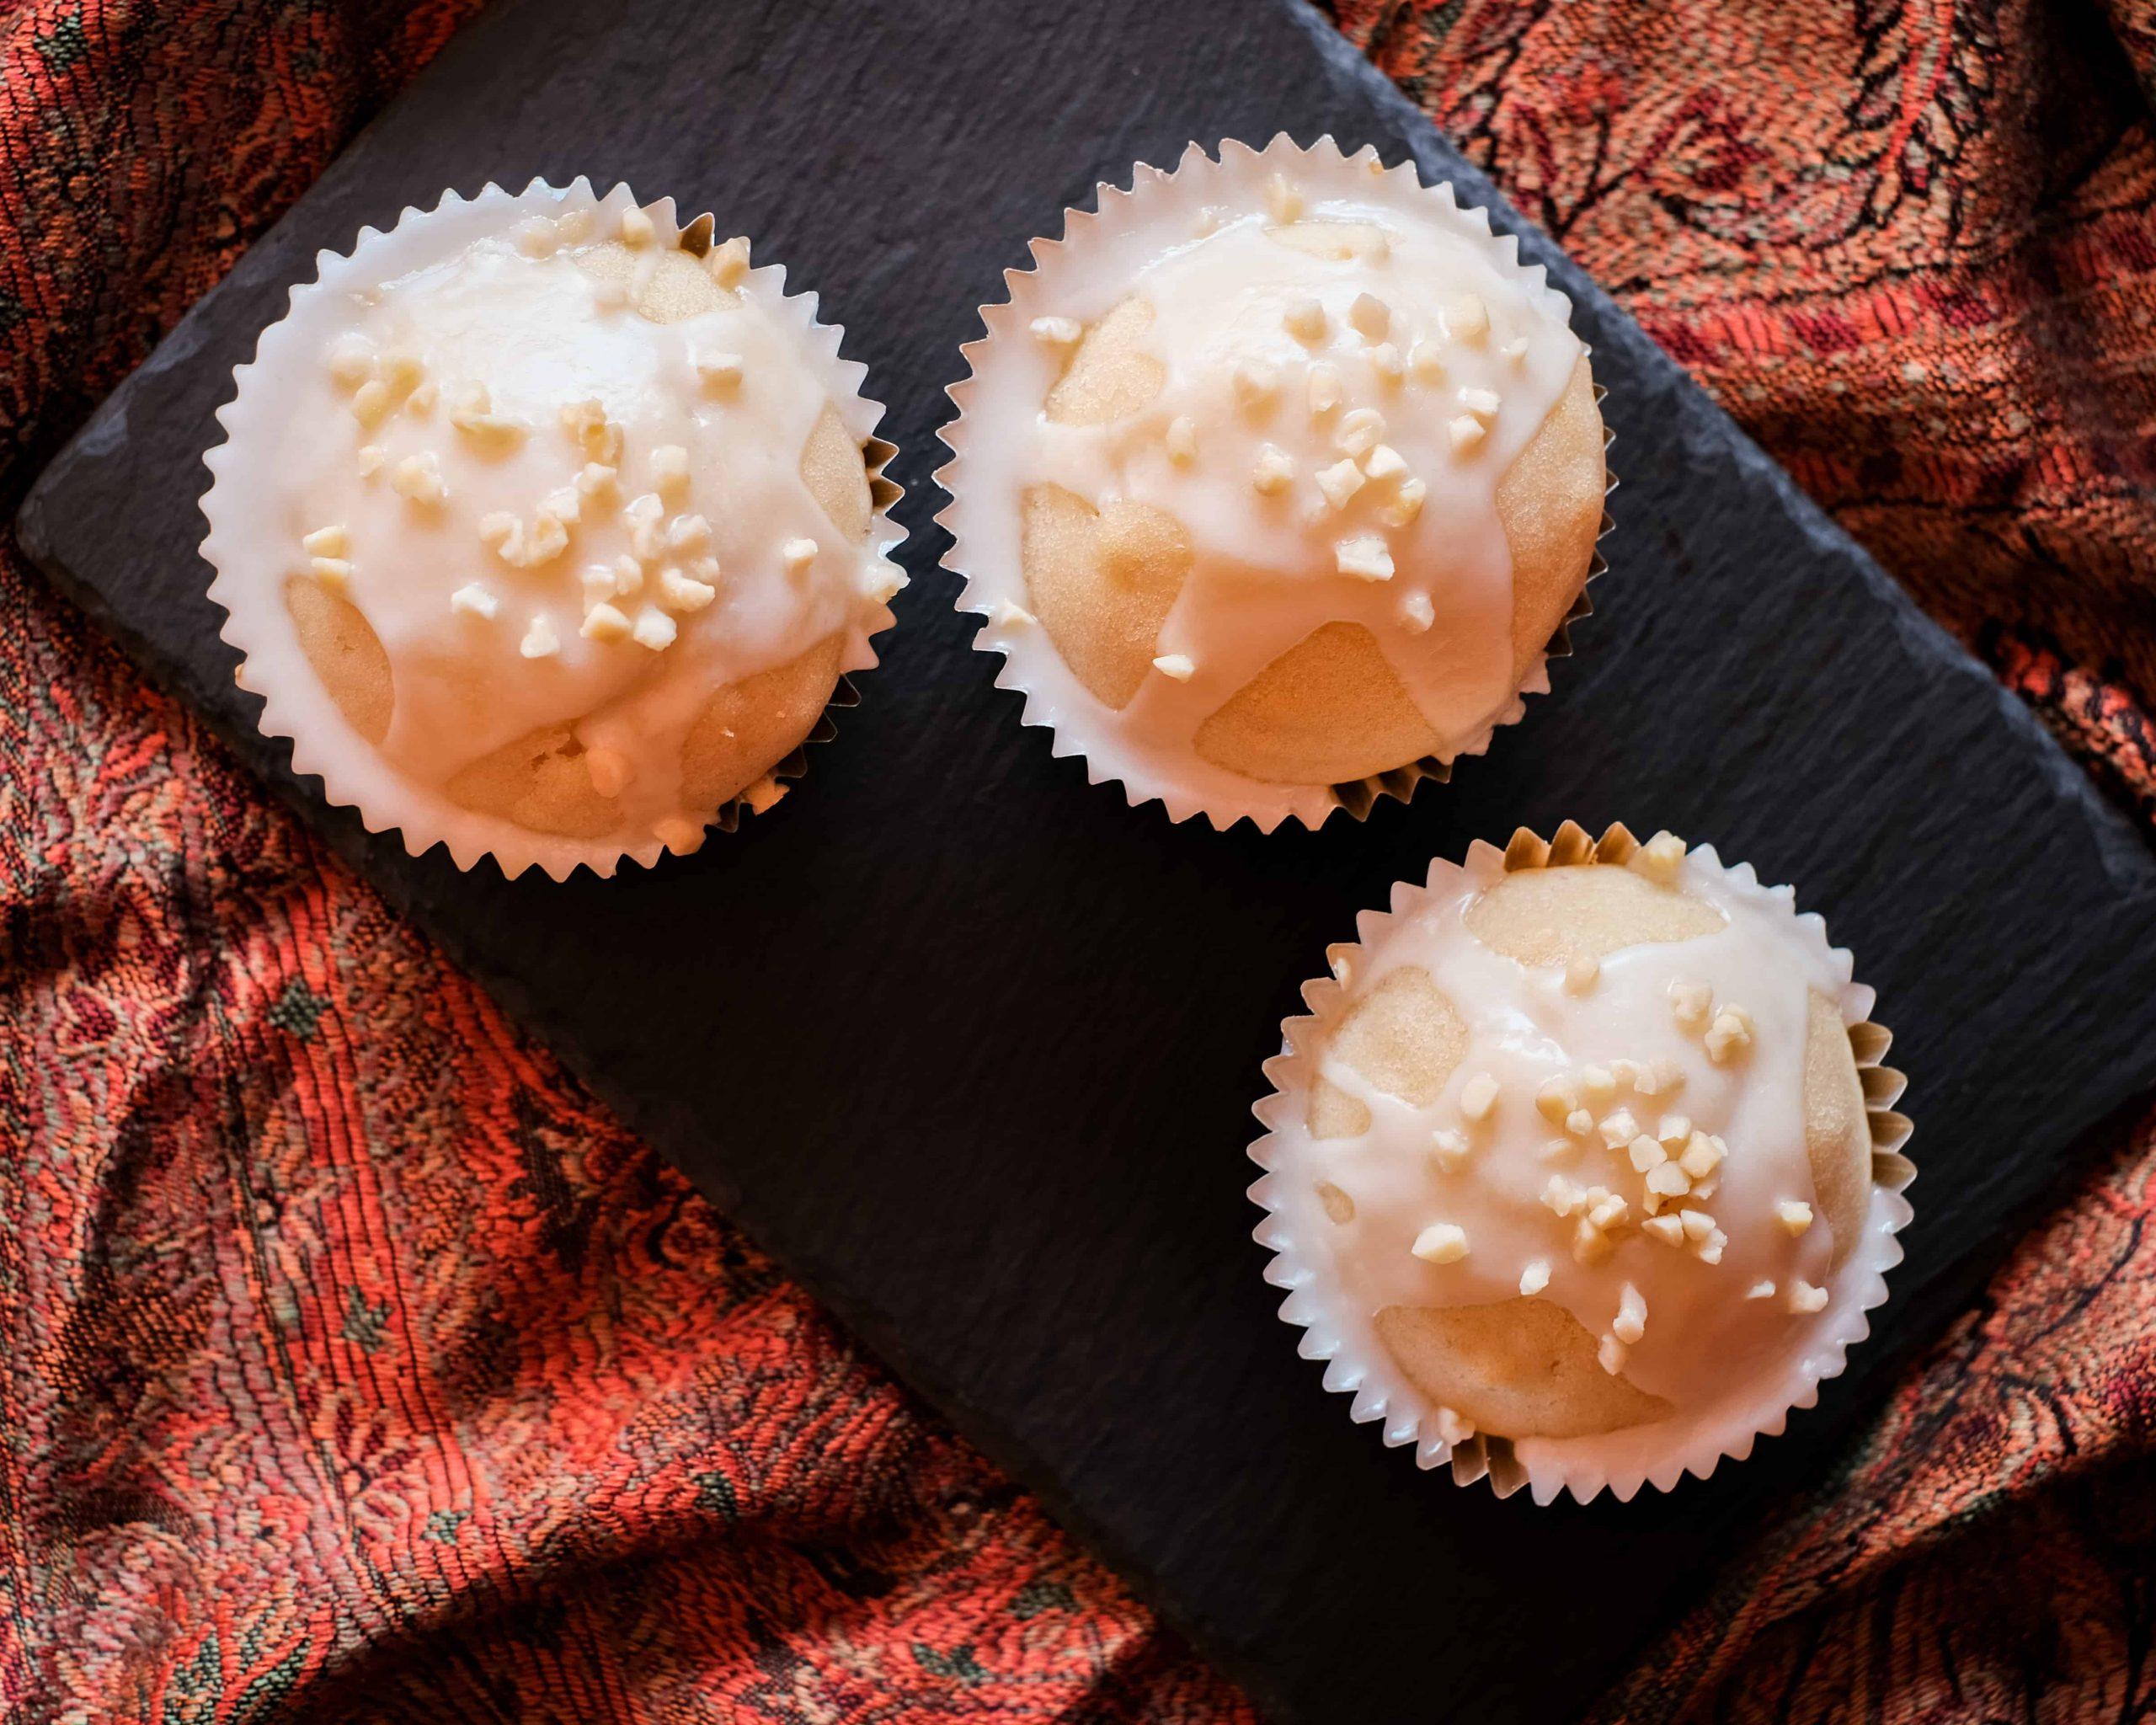 Overhead Vegan Almond Cupcakes image.